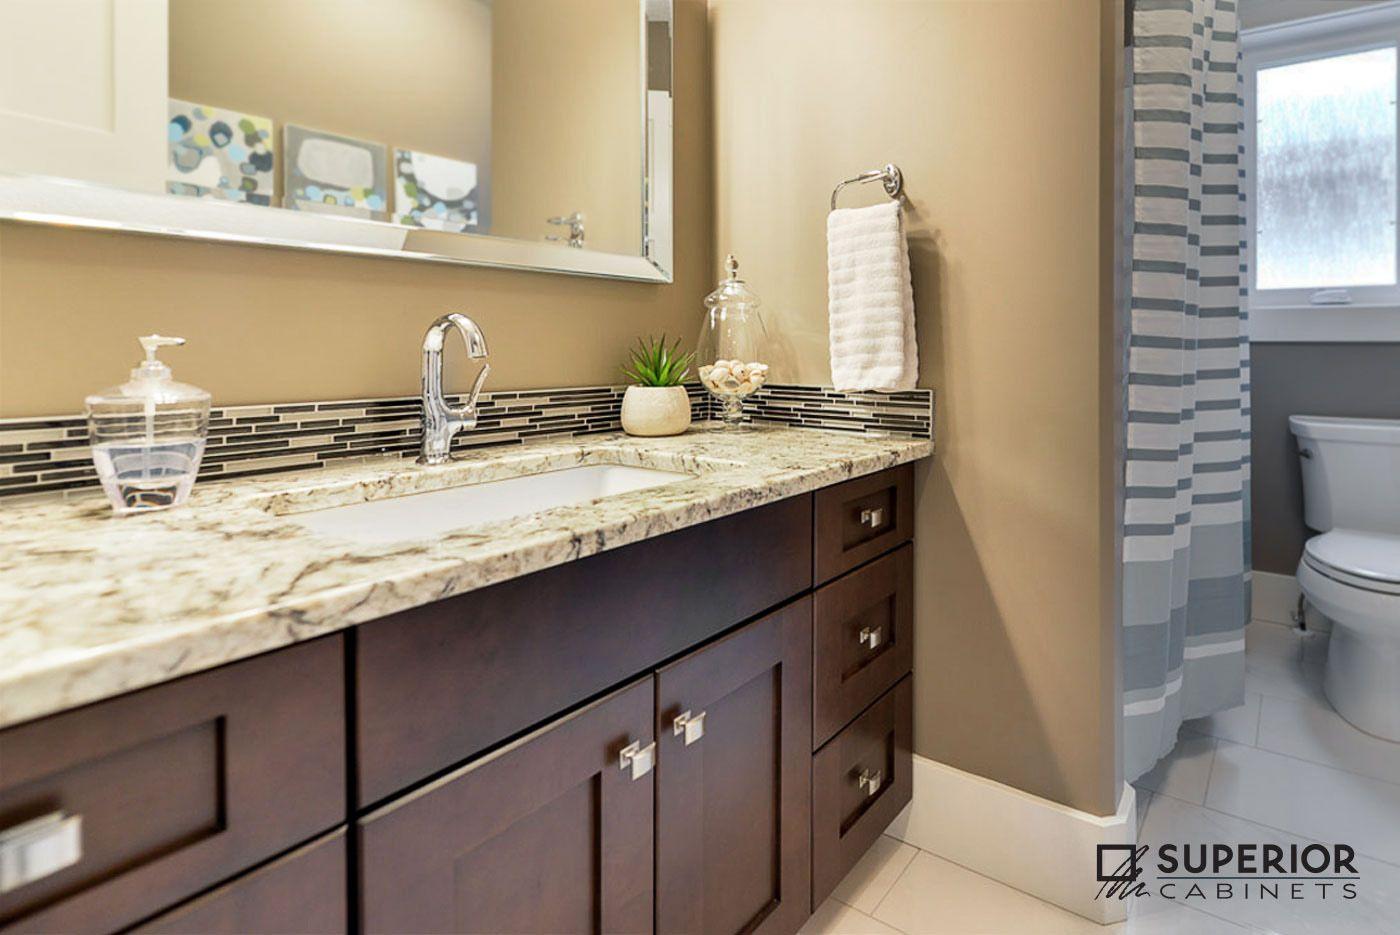 Bathroom Cabinets Edmonton designwendy prodaniuk, superior cabinets edmonton. cabinets